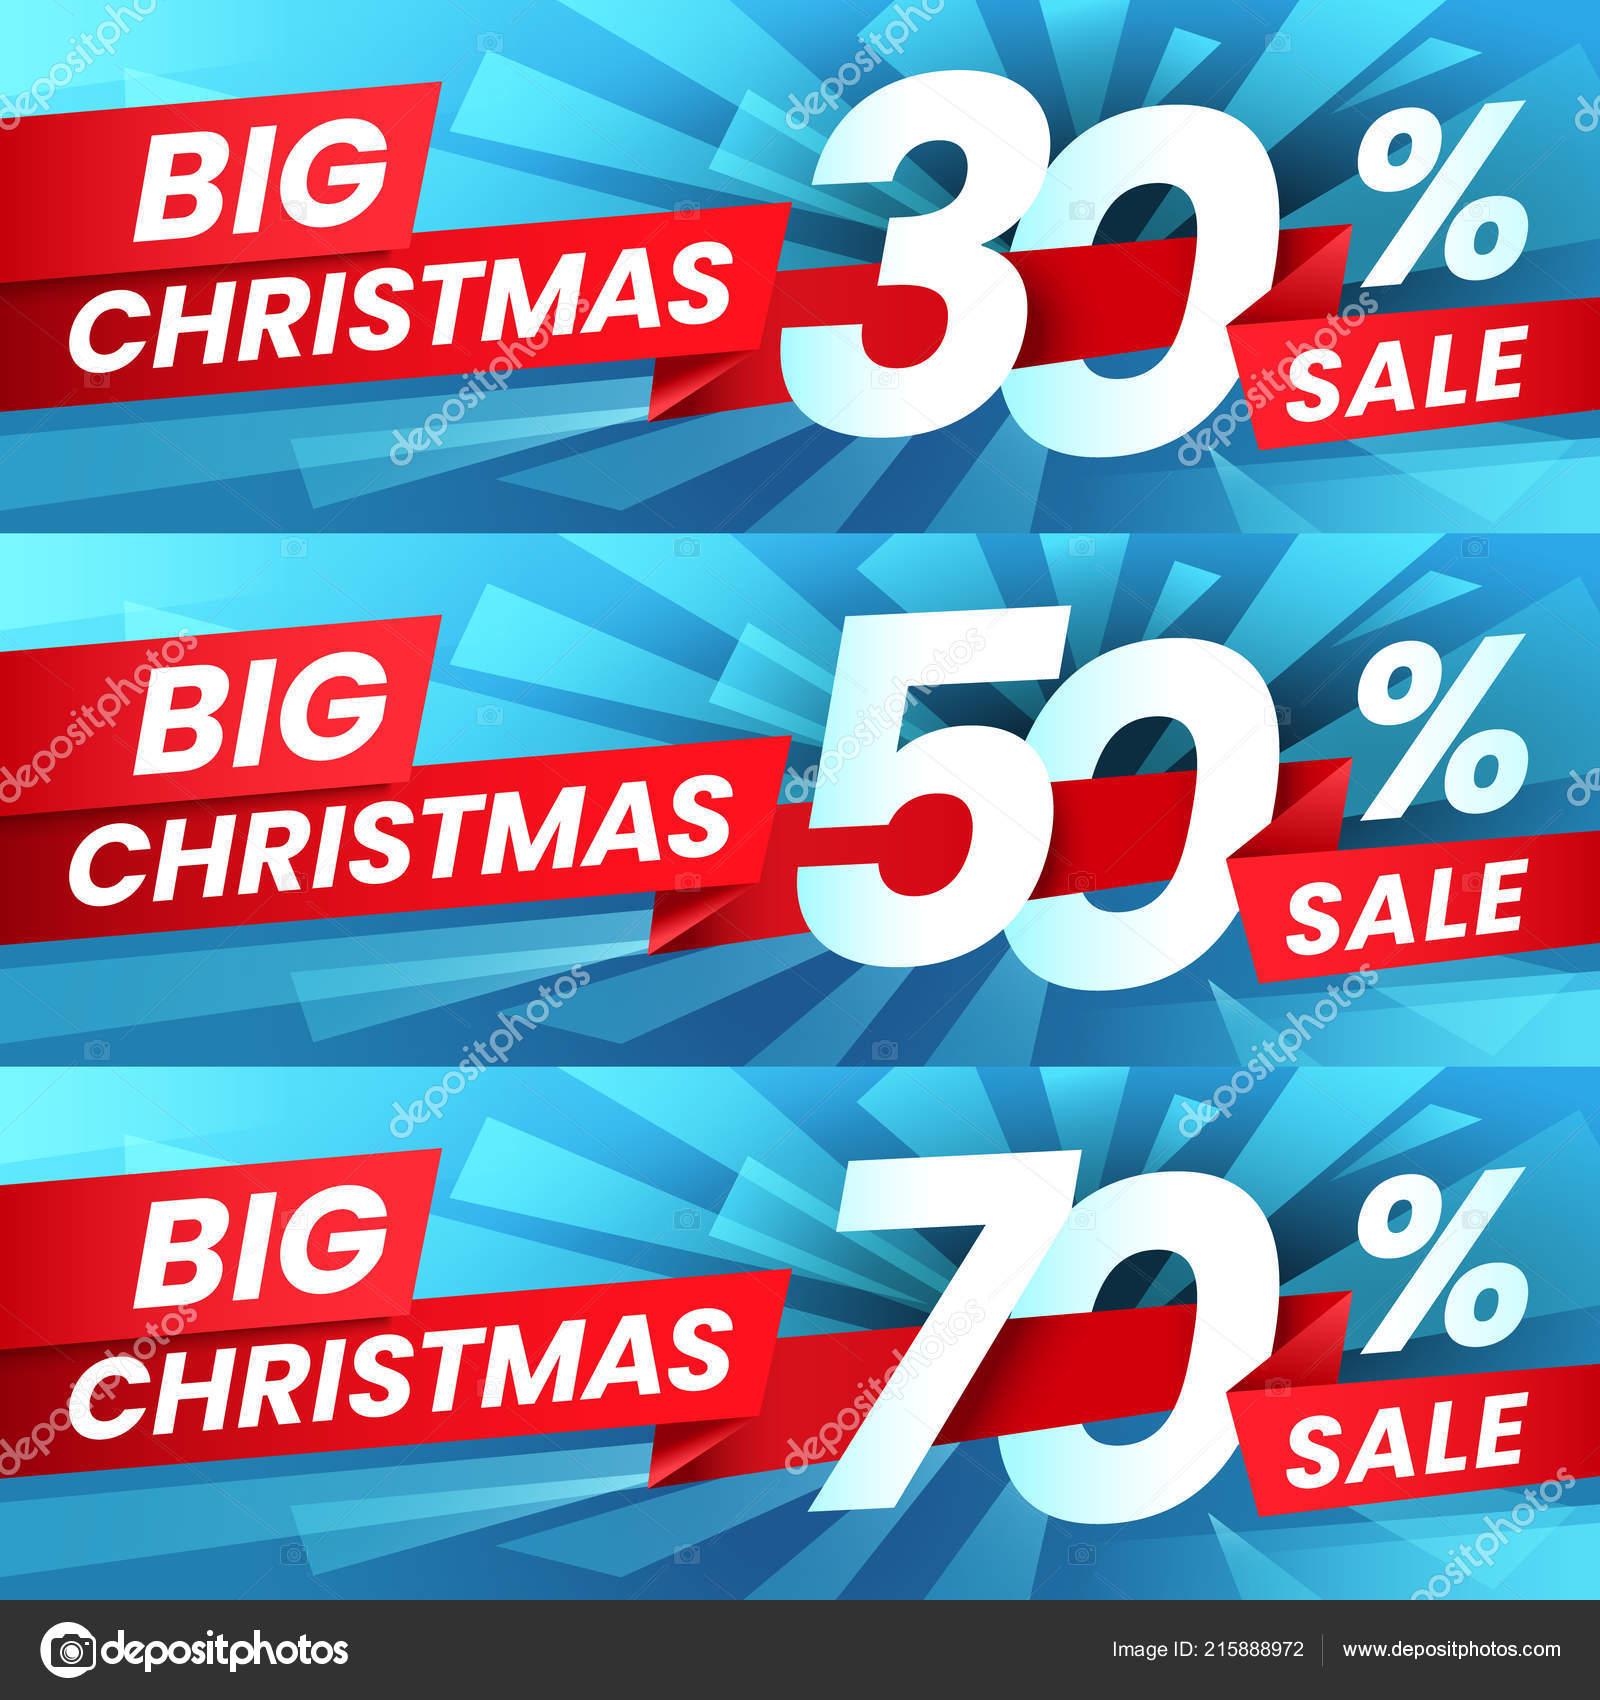 1844c322df7 Χριστούγεννα διαφημιστικών πωλήσεων εκπτώσεις, προσφορές, χειμερινές  διακοπές ειδική